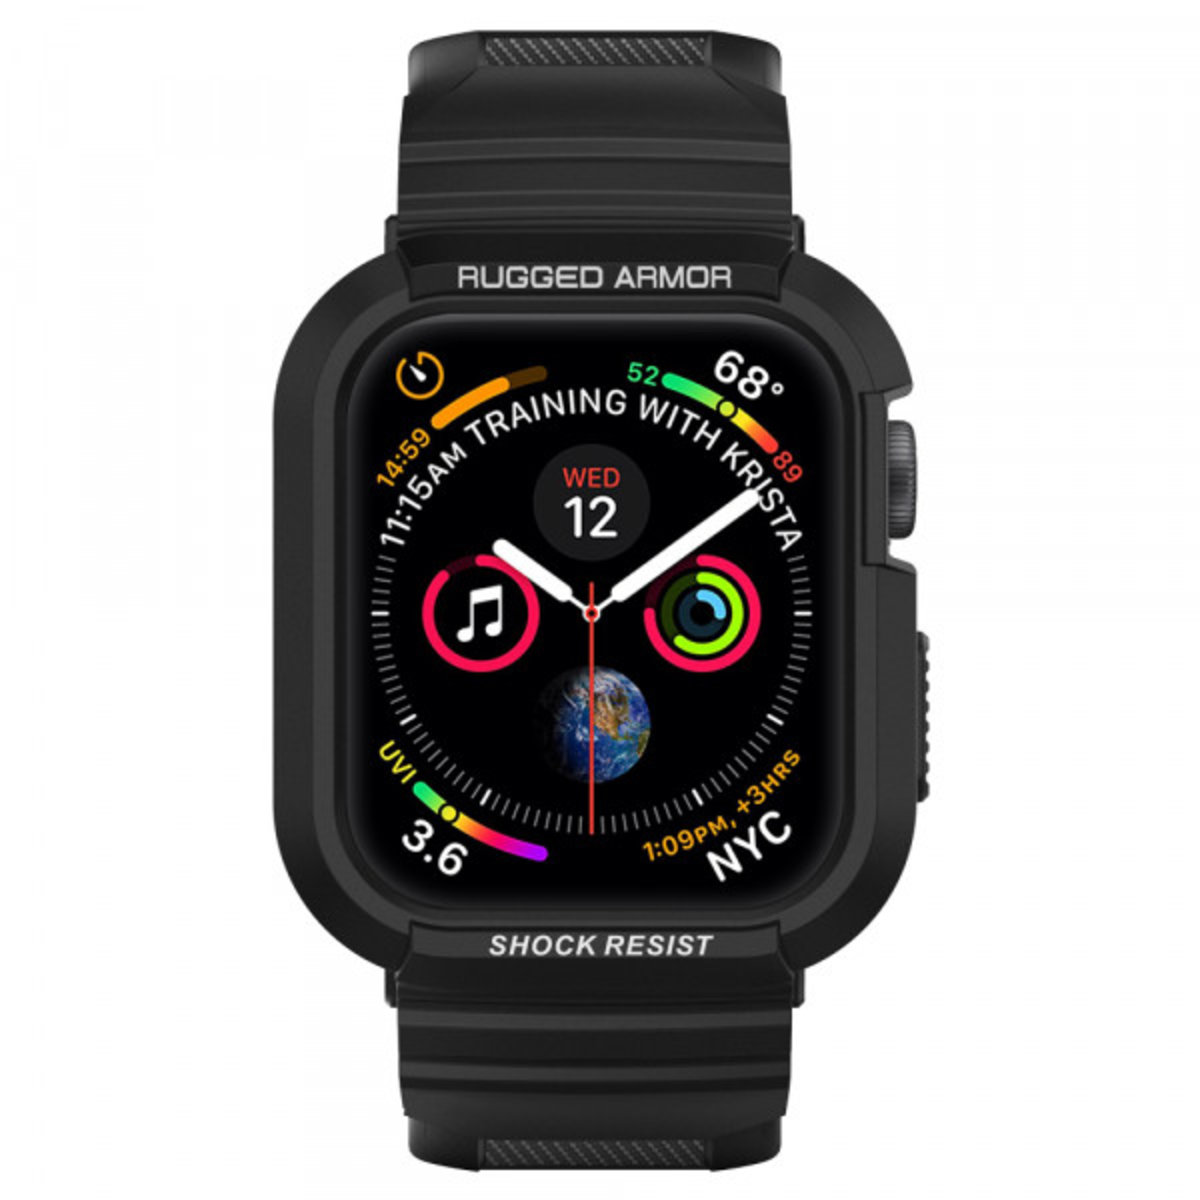 Apple Watch Series 4 (44mm) Case Rugged Armor Pro - Black